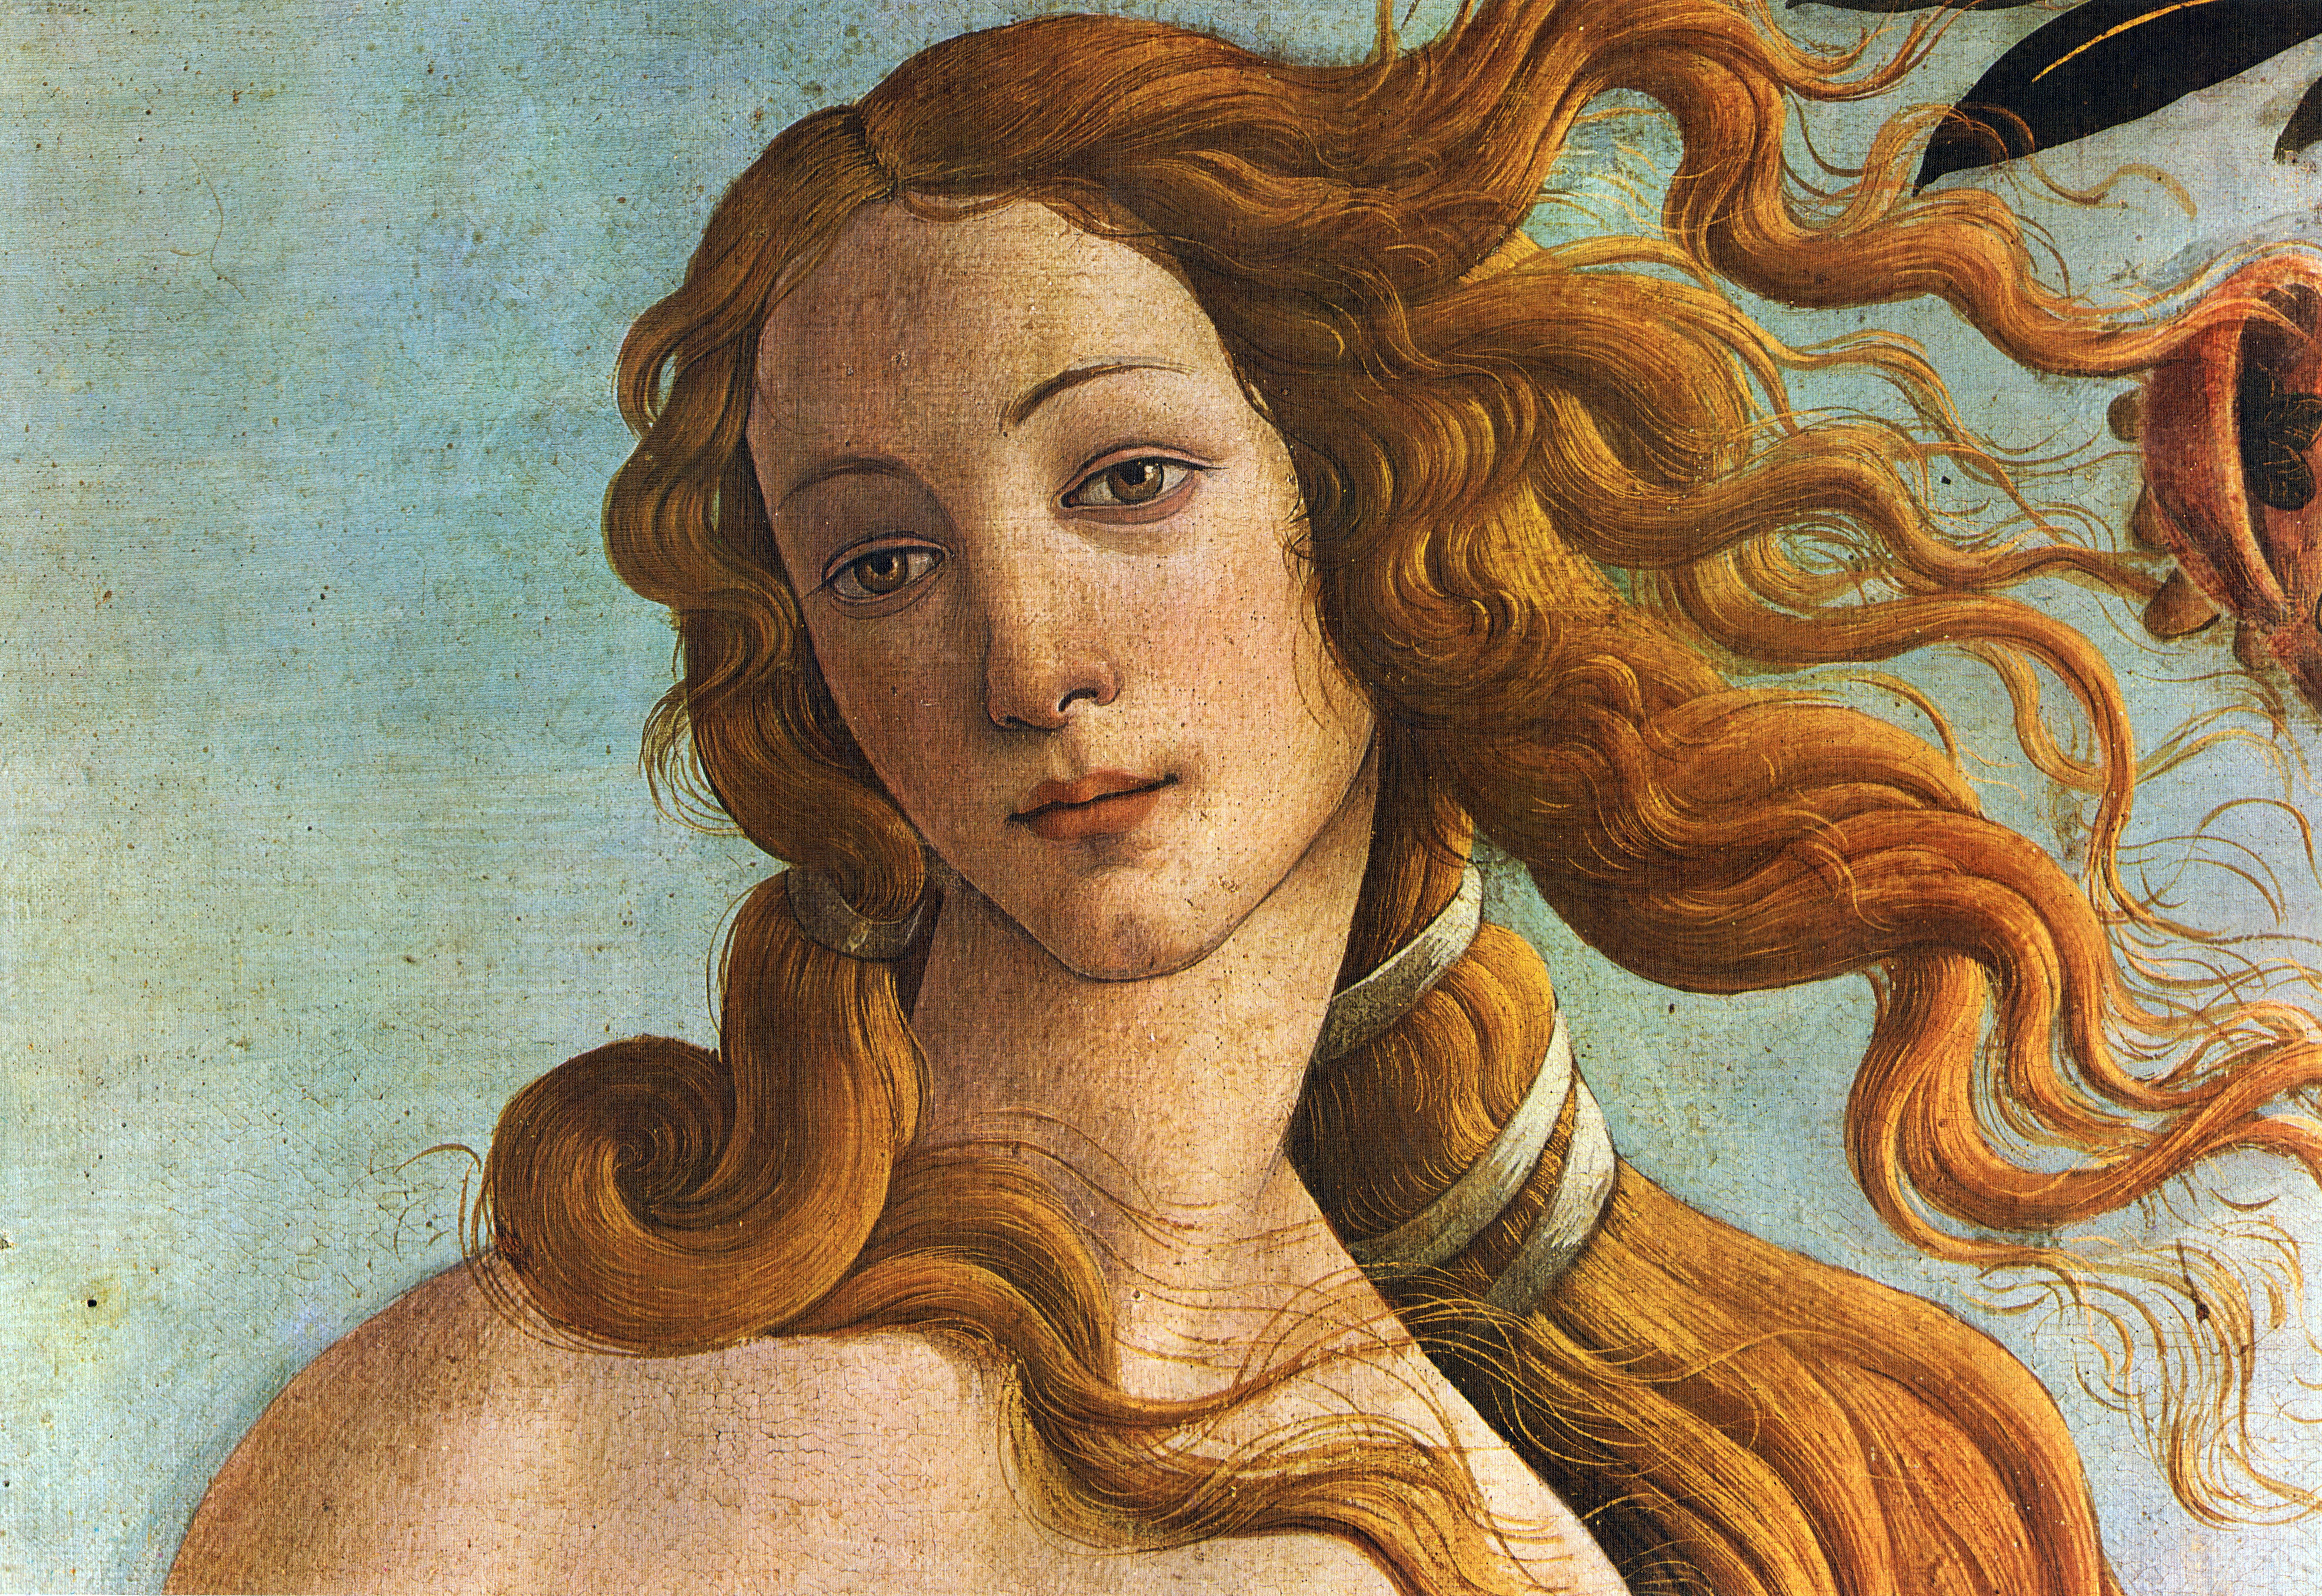 File:The Birth of Venus (Botticelli - 16809.0KB